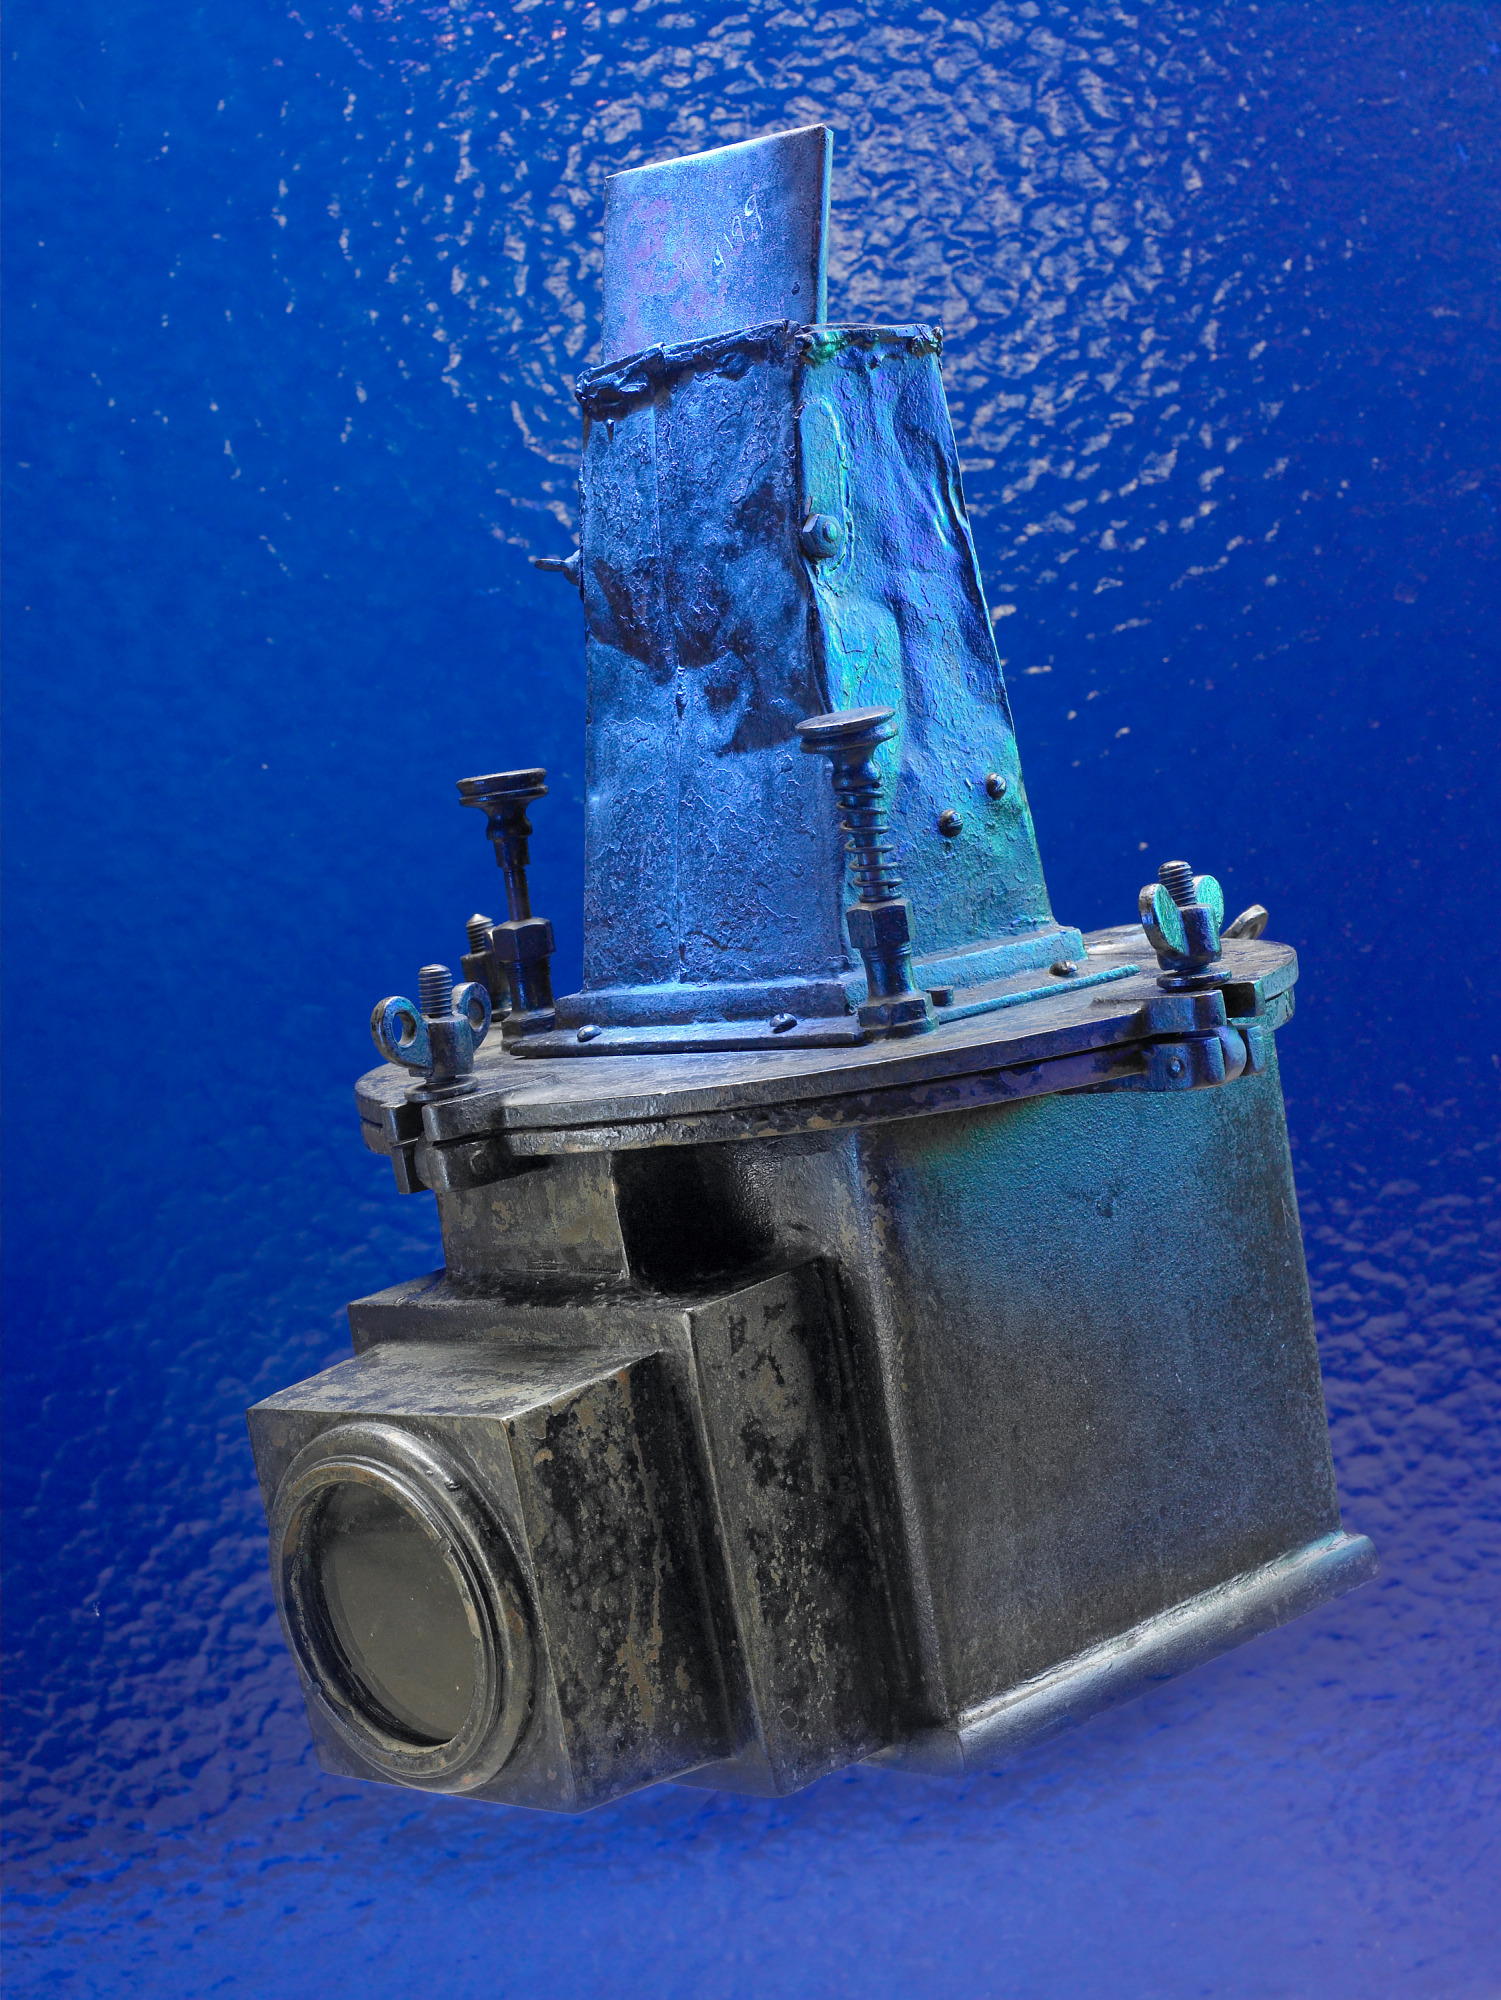 images for Auto-Graflex Camera in Underwater Housing